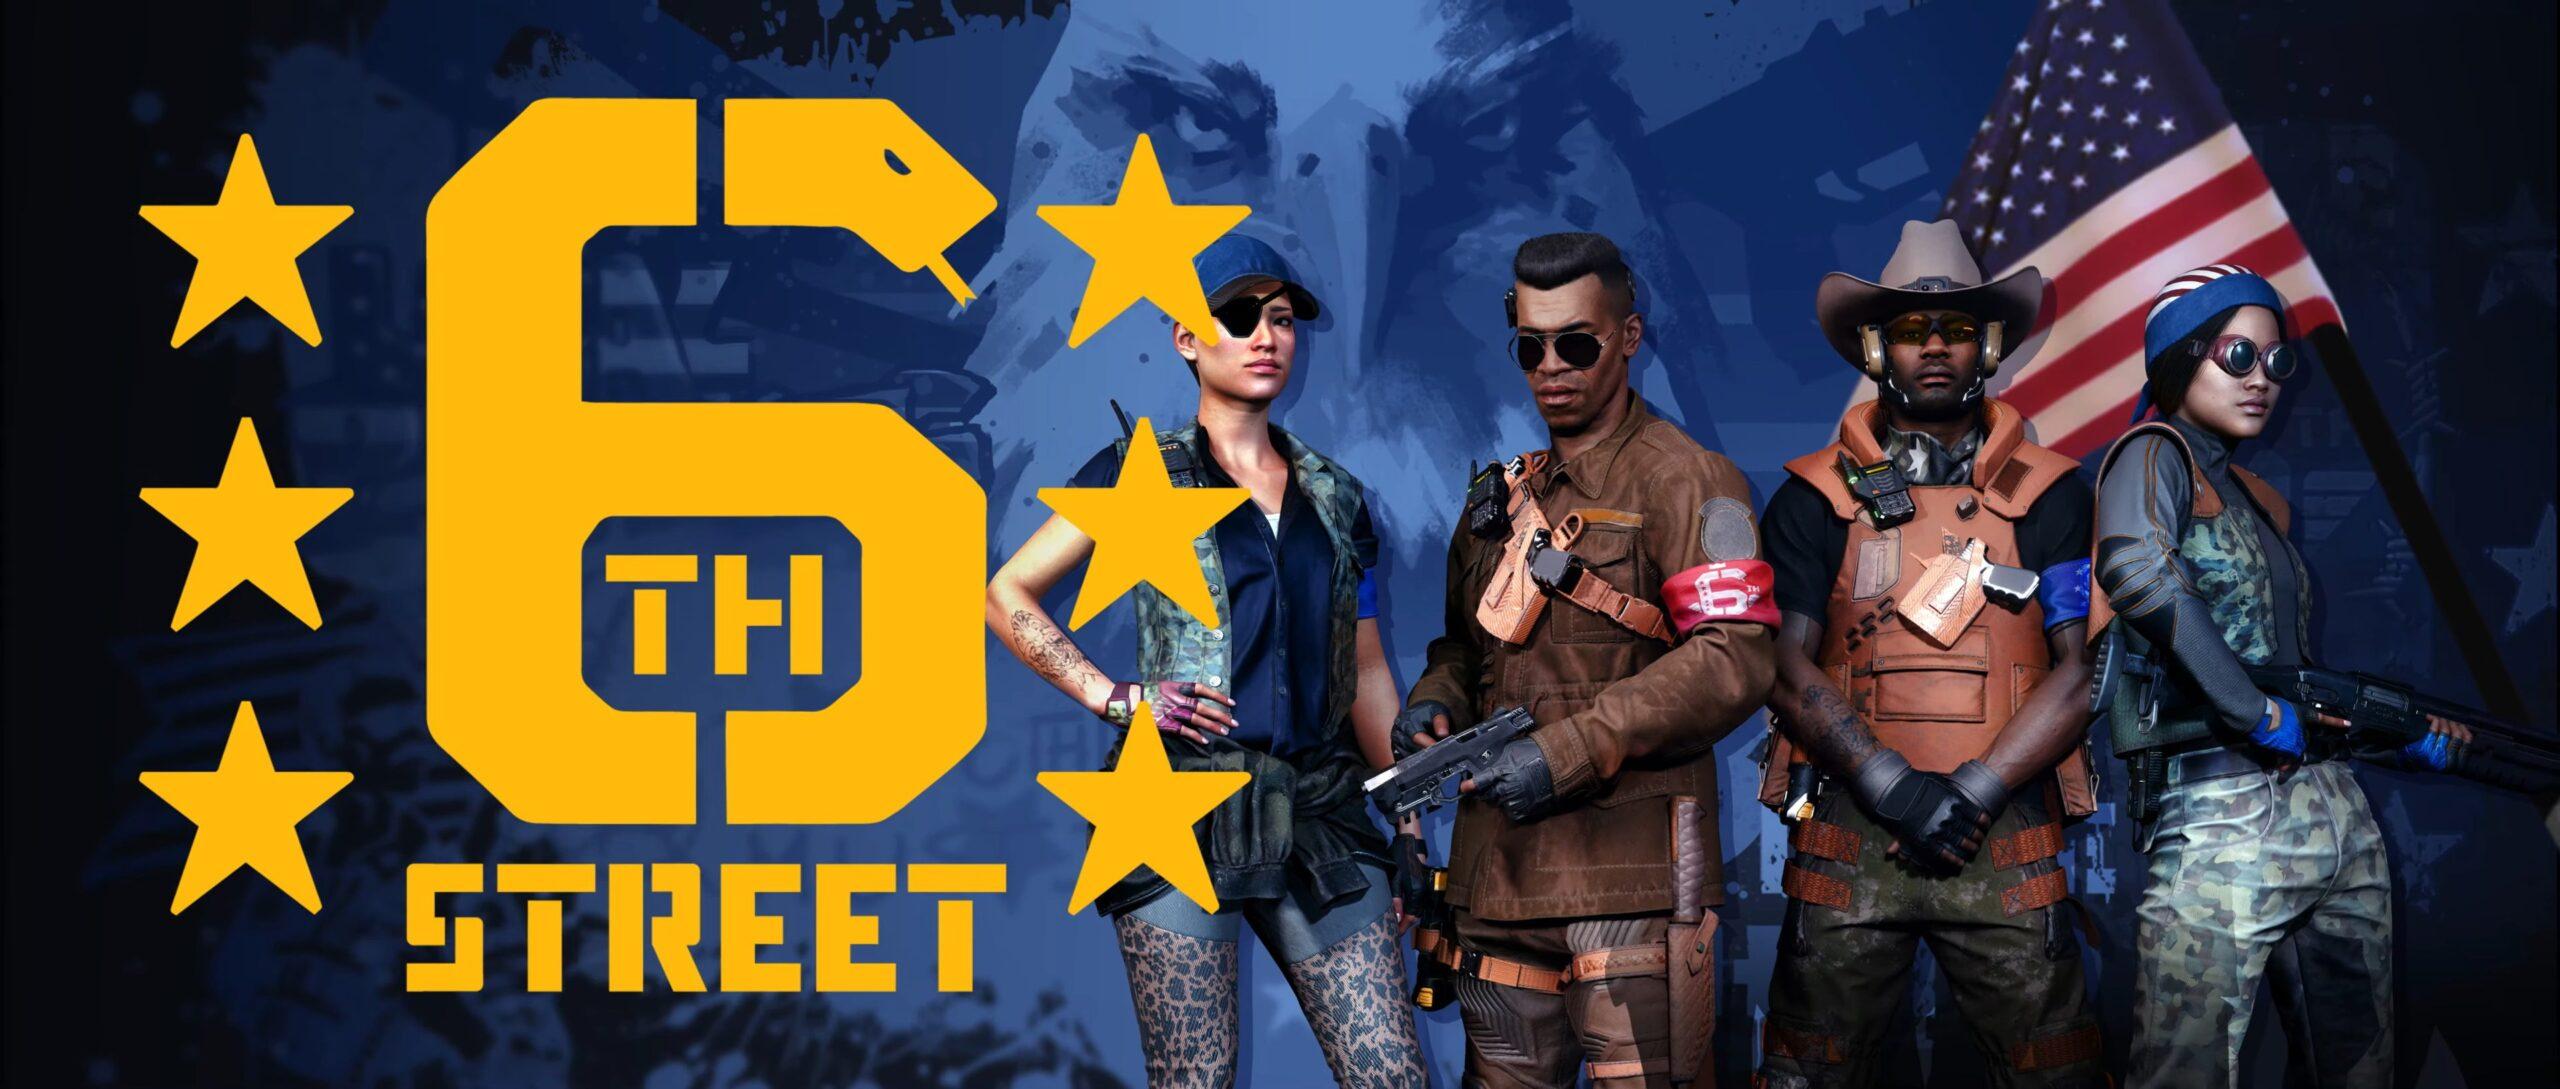 Cyberpunk 2077 — Gangs Of Night City 6th Street